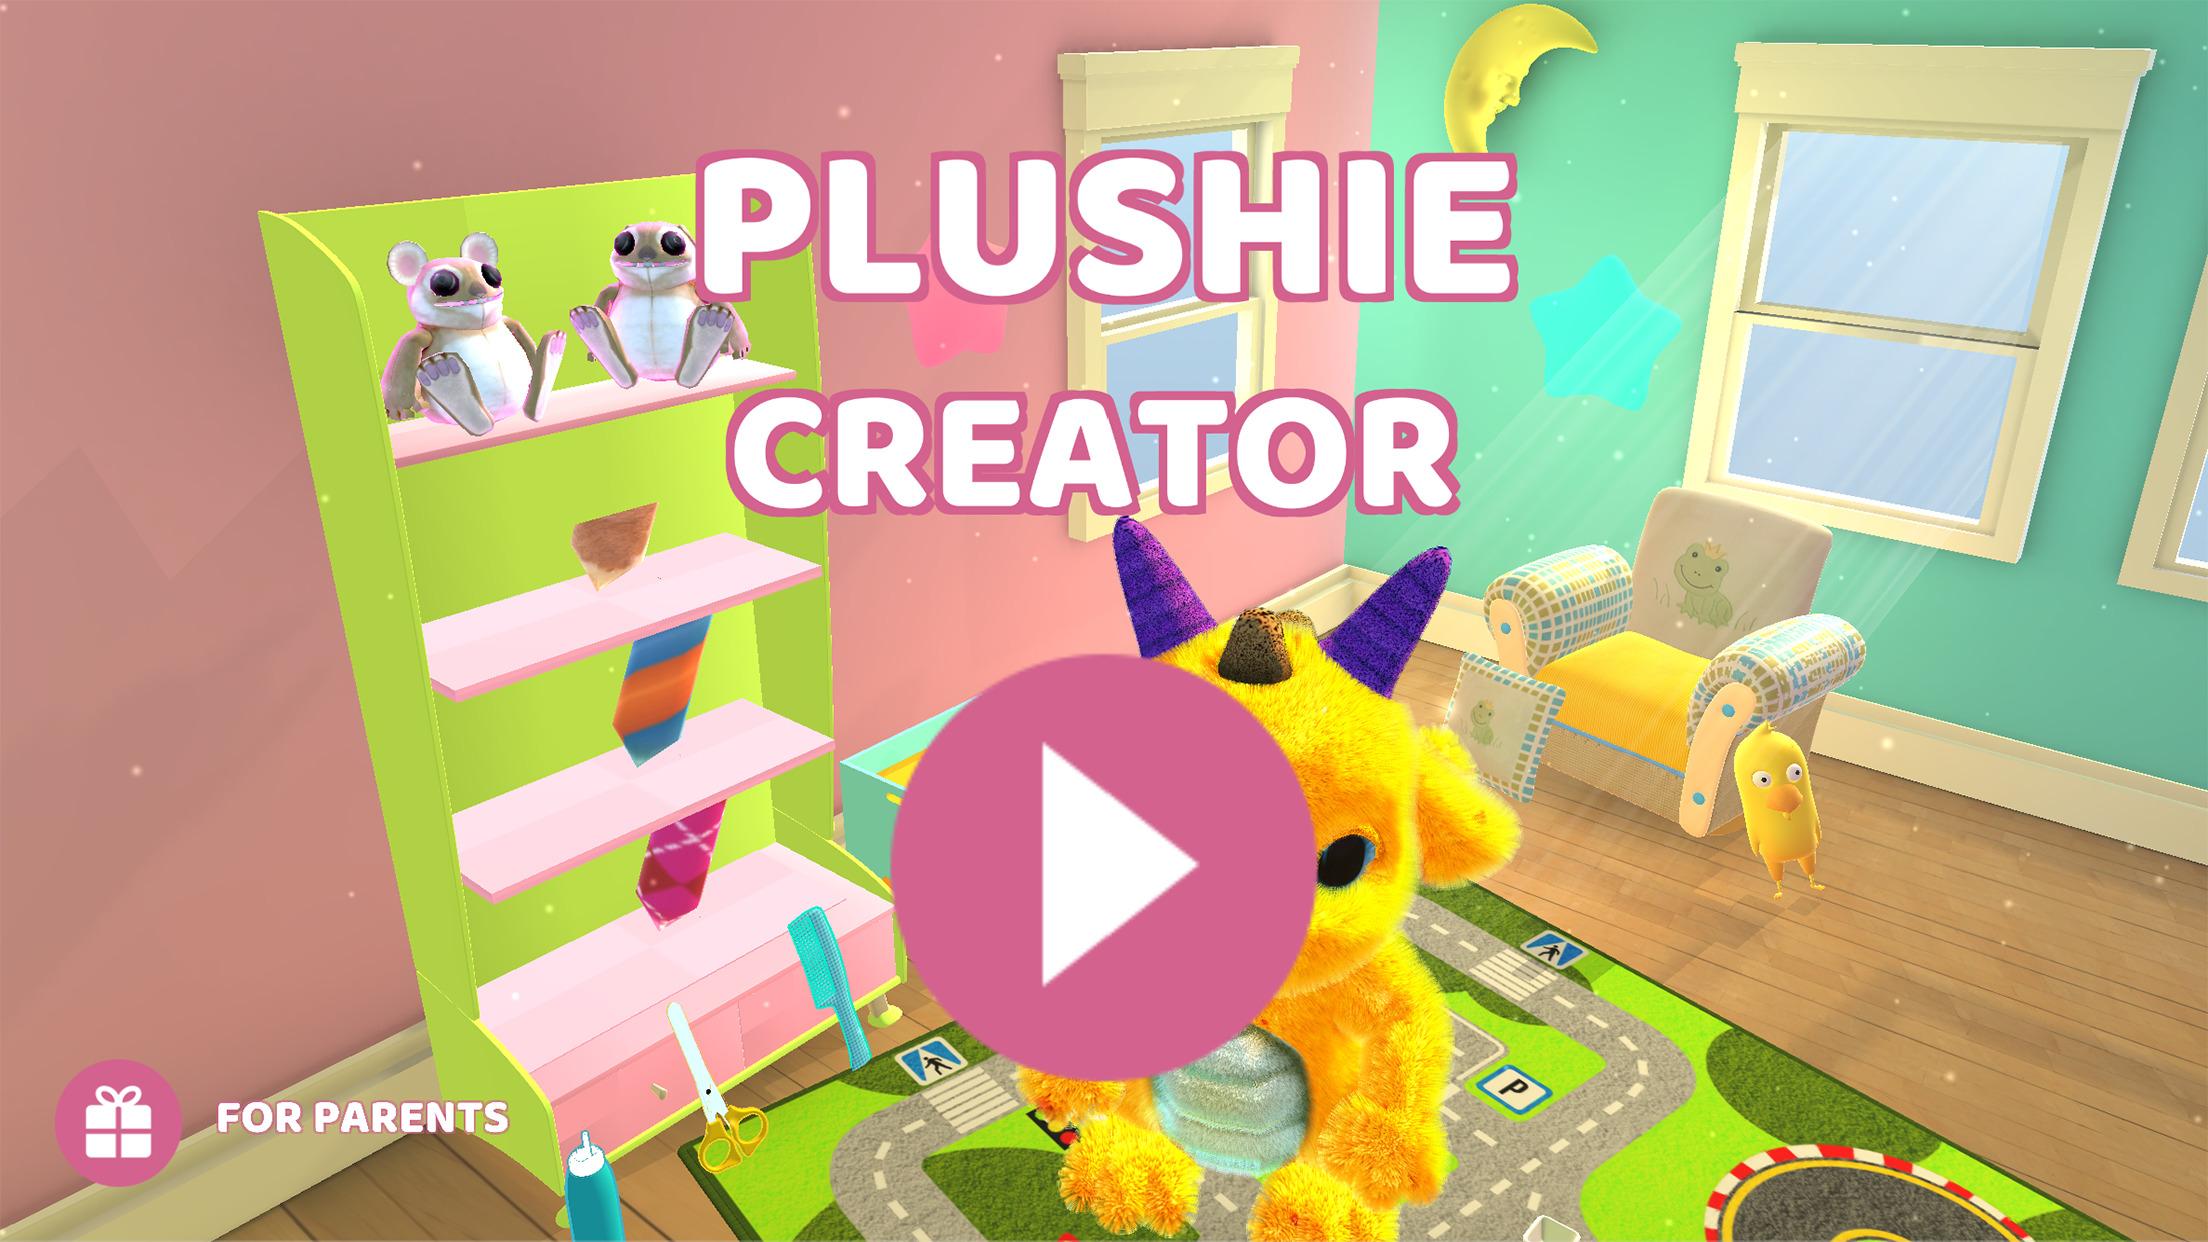 Plushie Creator